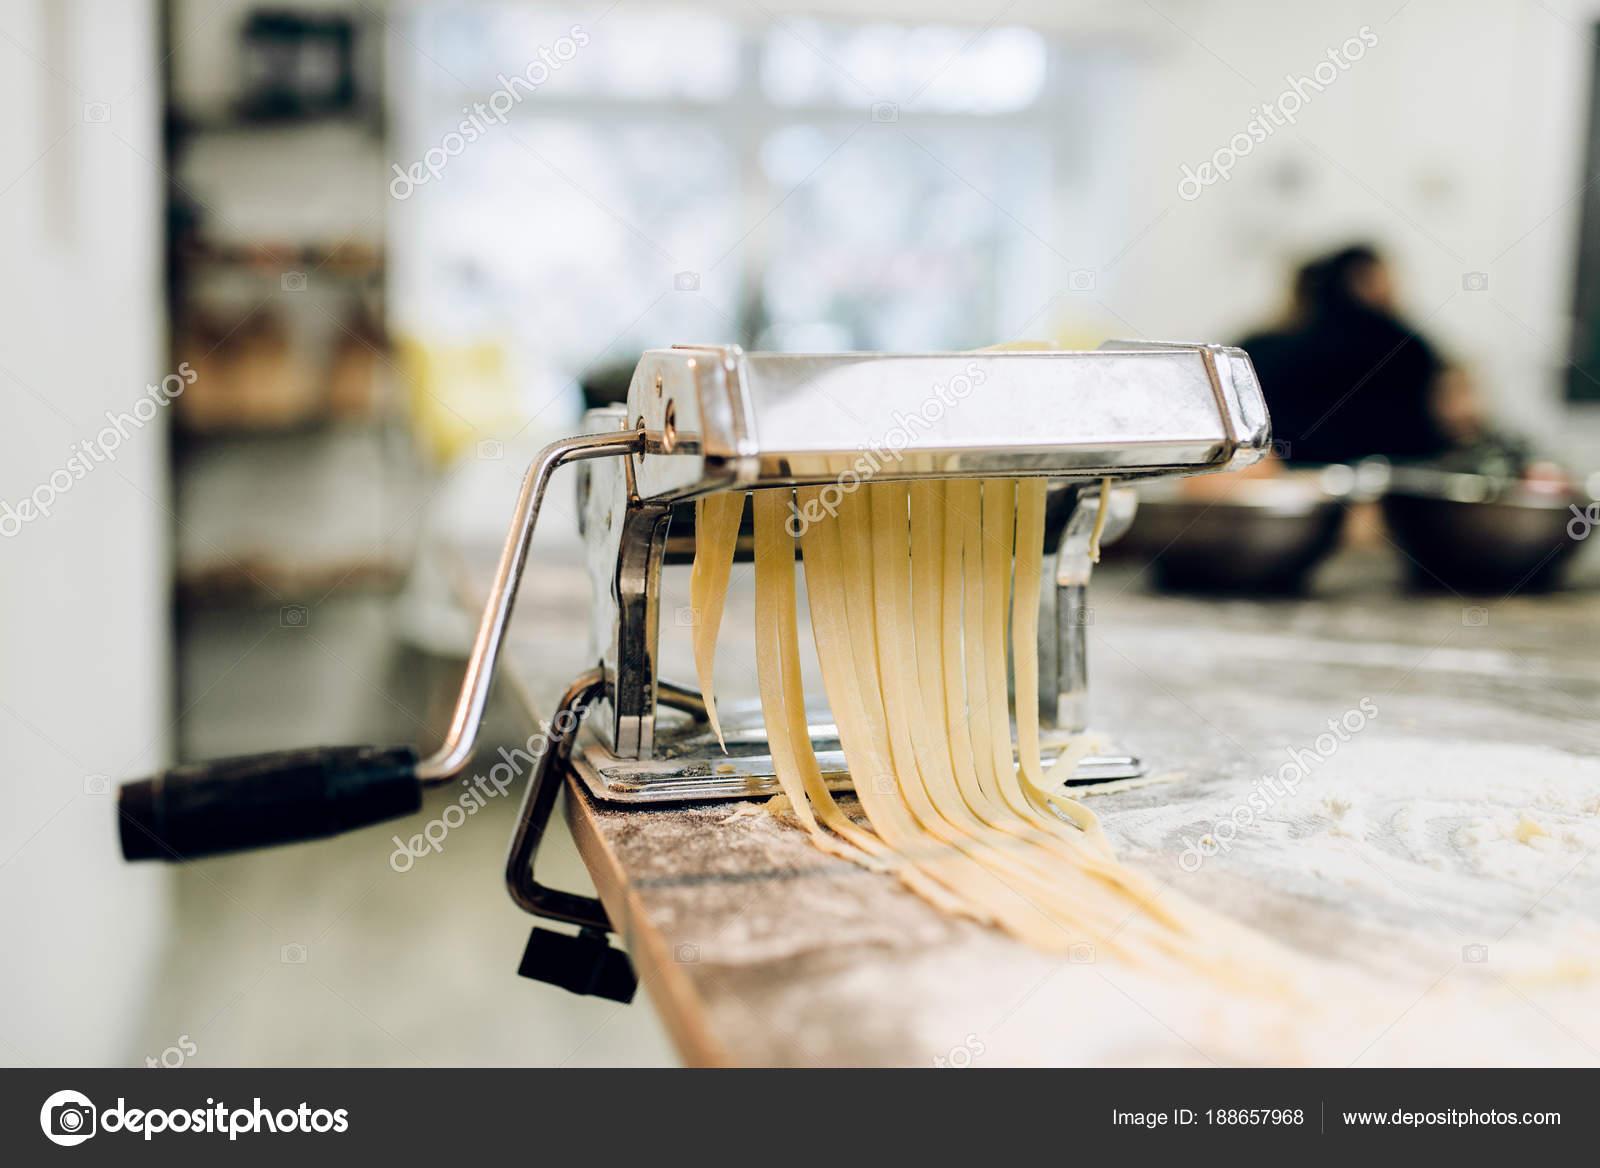 kitchen tabletops memory foam runner 木制厨房桌面面团机 图库照片 c nomadsoul1 188657968